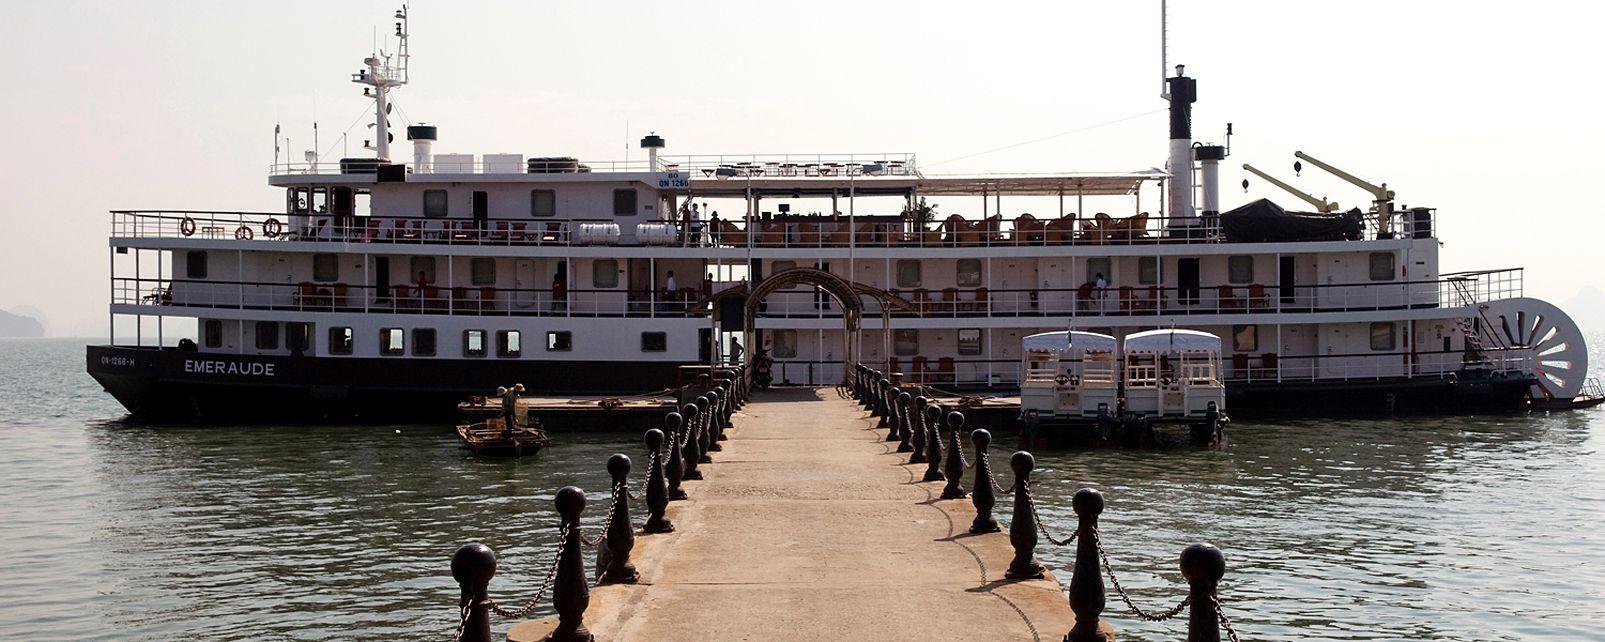 Hotel Emeraude bateau